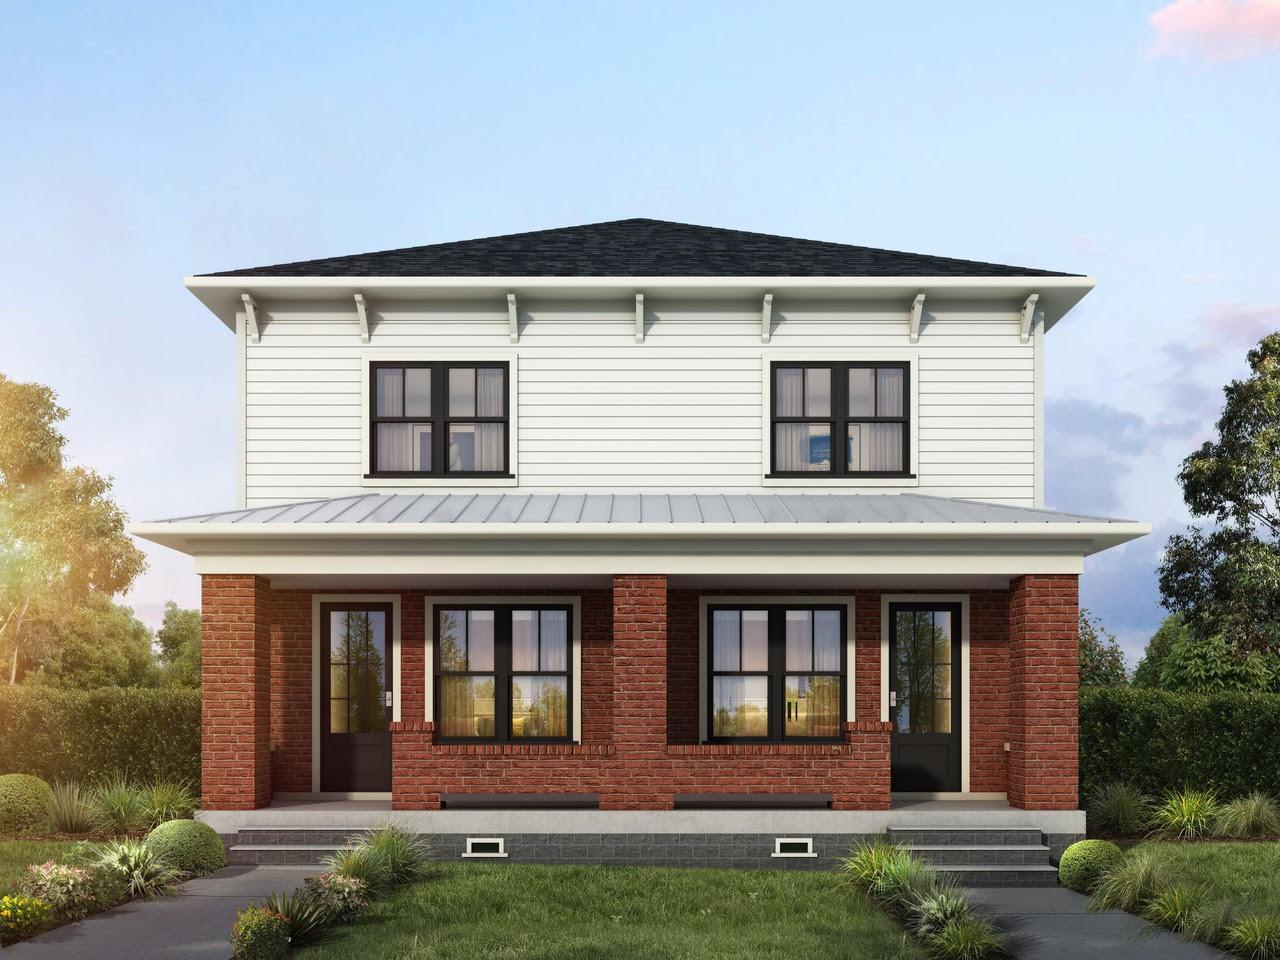 1820A 4th Ave, N, Nashville, TN 37208 - Nashville, TN real estate listing